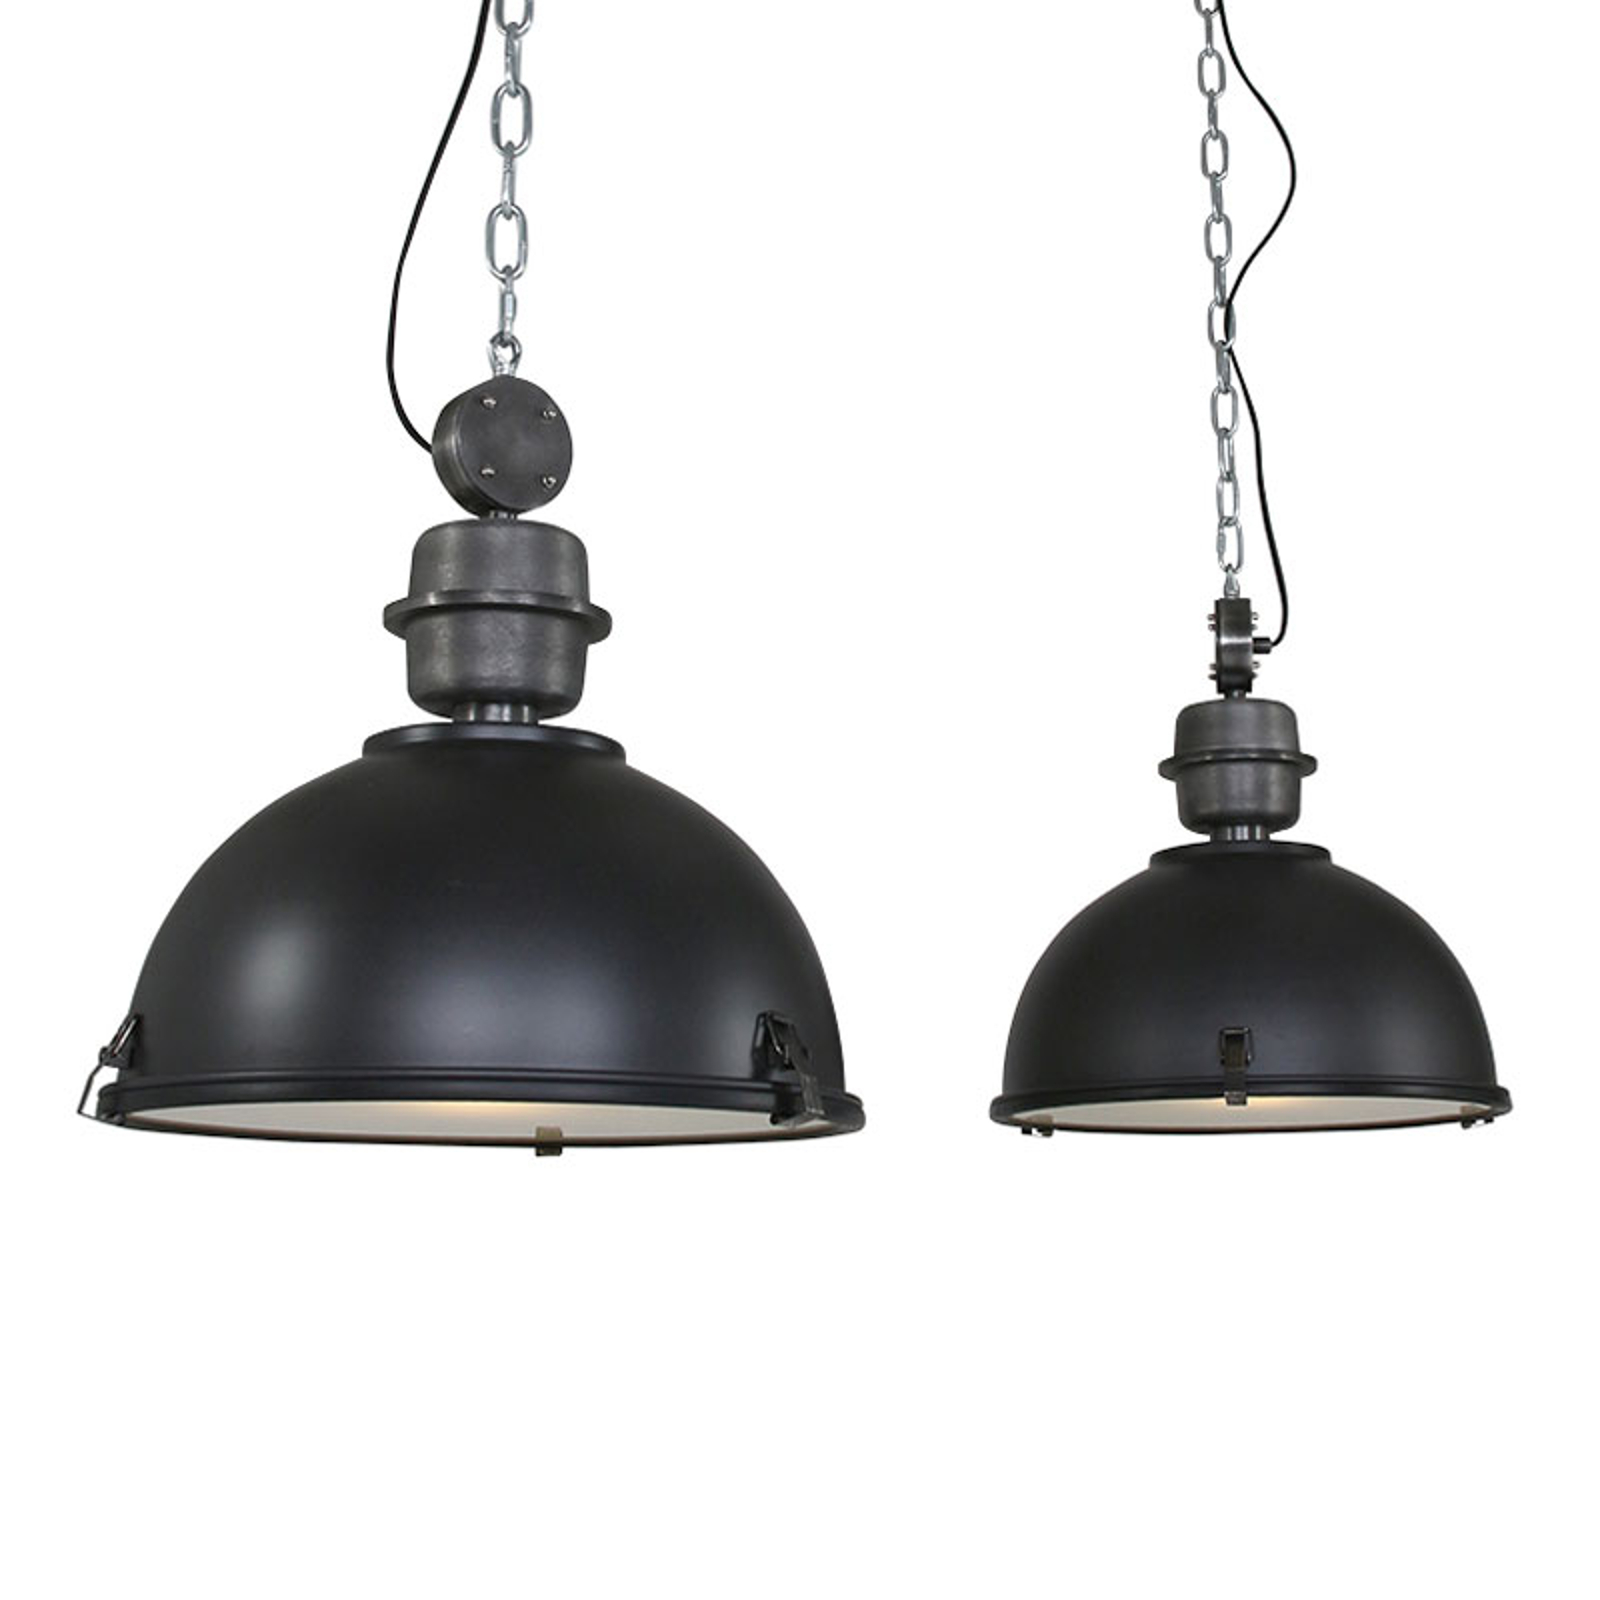 Lampa wisząca Bikkel 2-punktowa, czarna